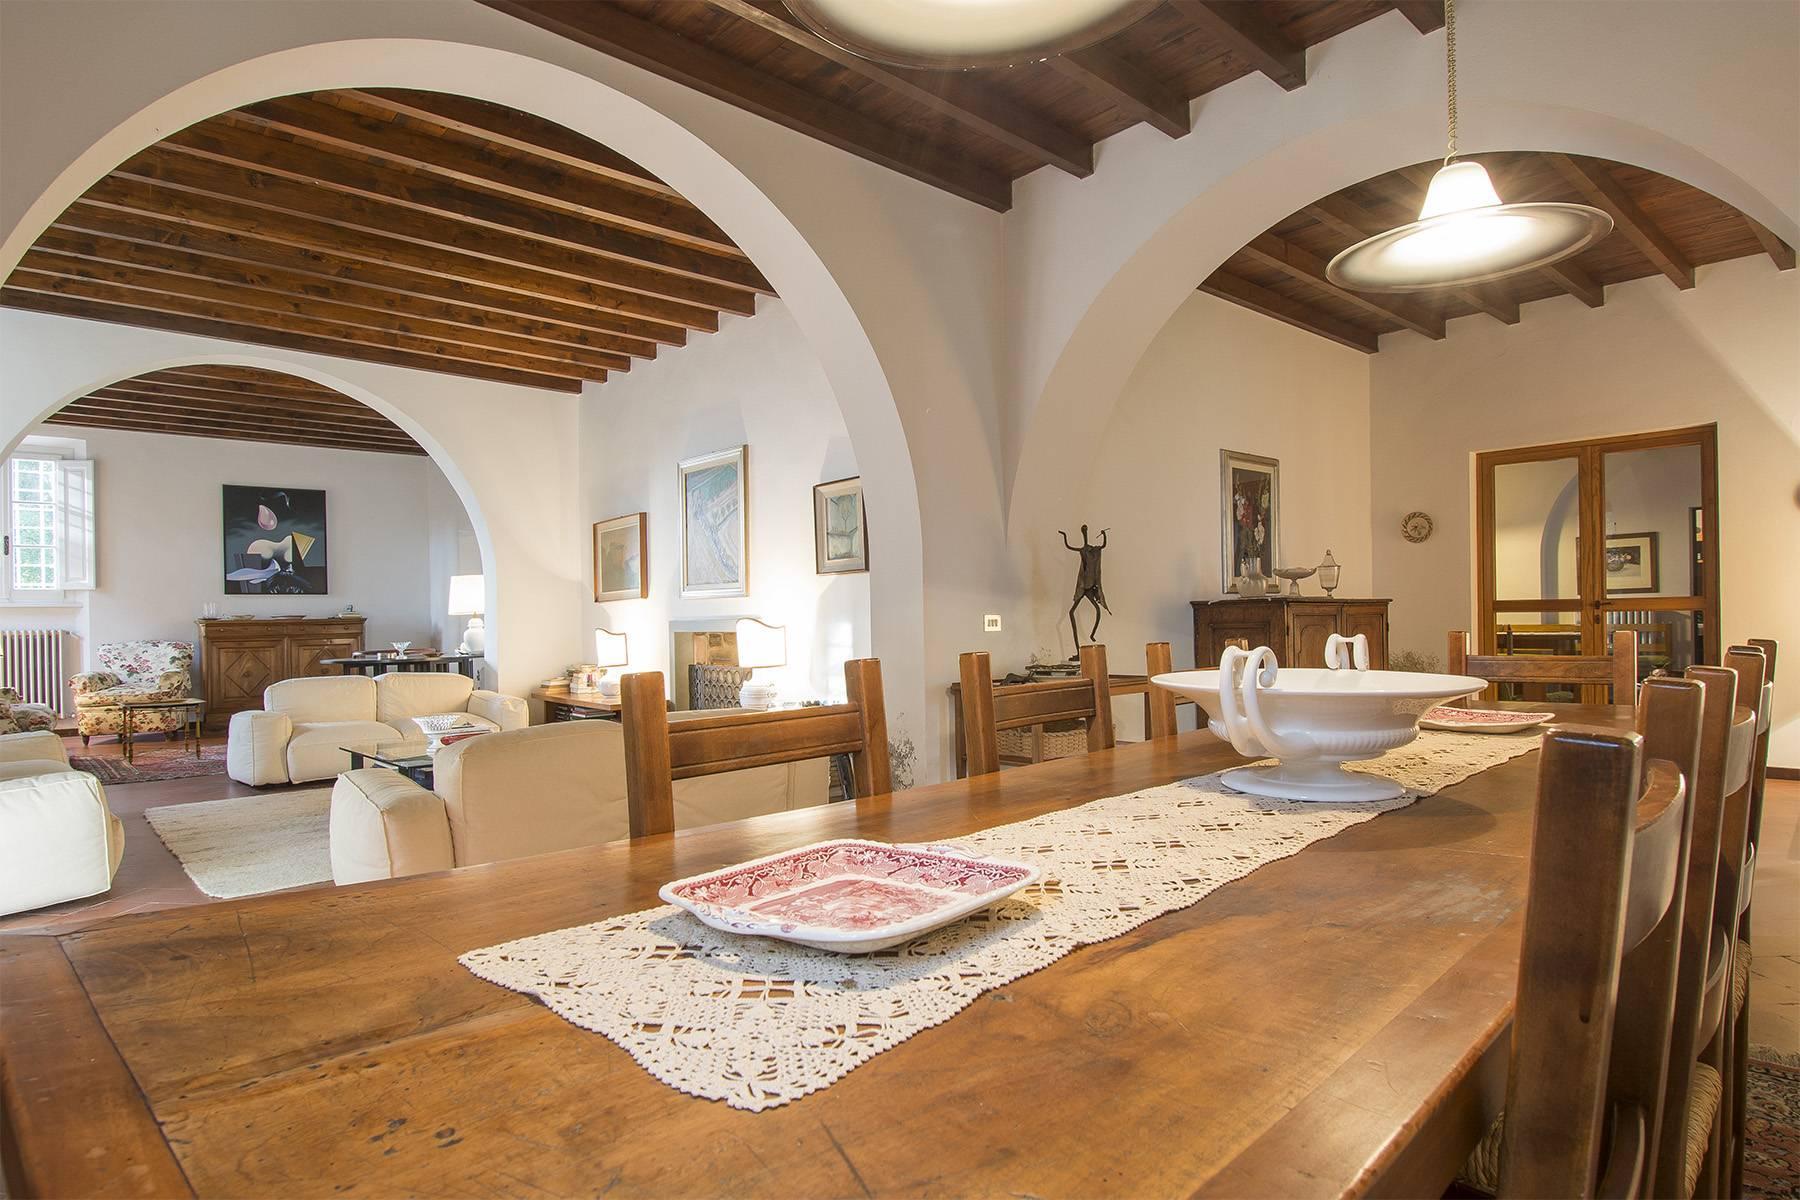 Winery with Historic Villa in San Miniato, Pisa - 7